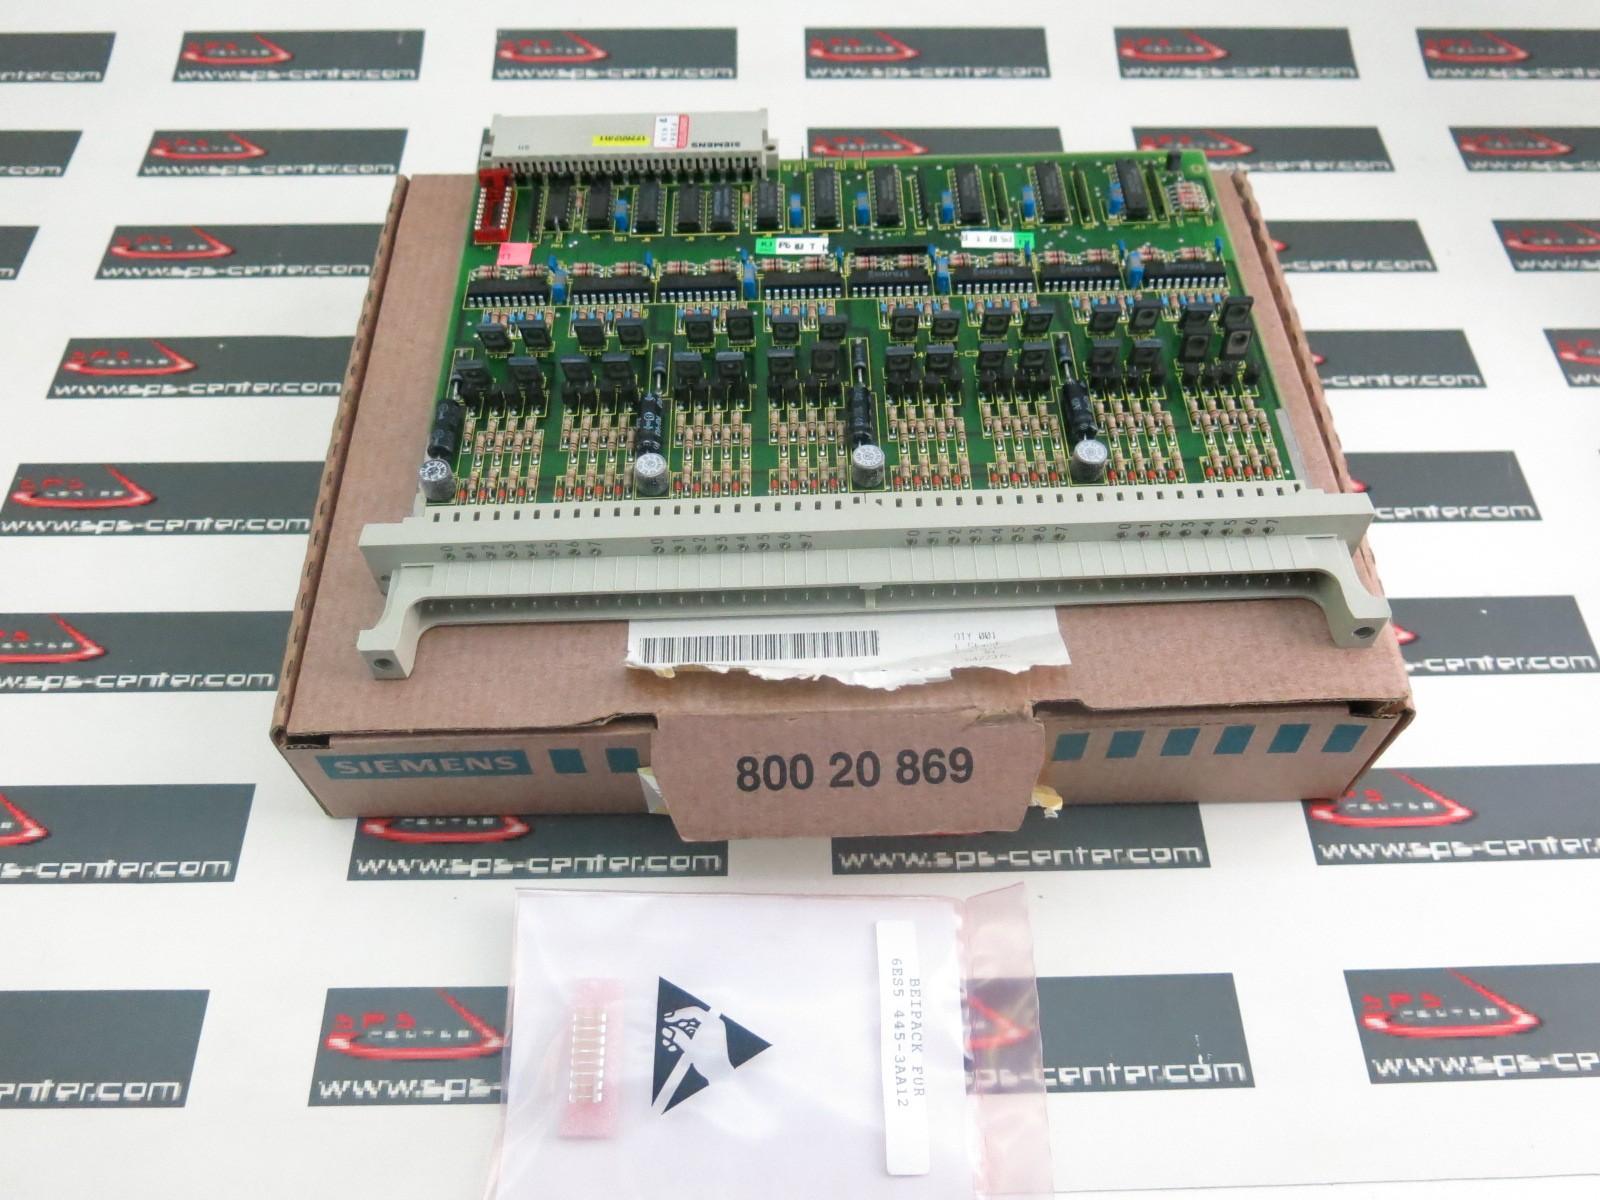 15C712 TAPE PTFE Impregnated Fiberglass Cloth Tape,3//4 In x 5 yd,5 mil,Tan Tan